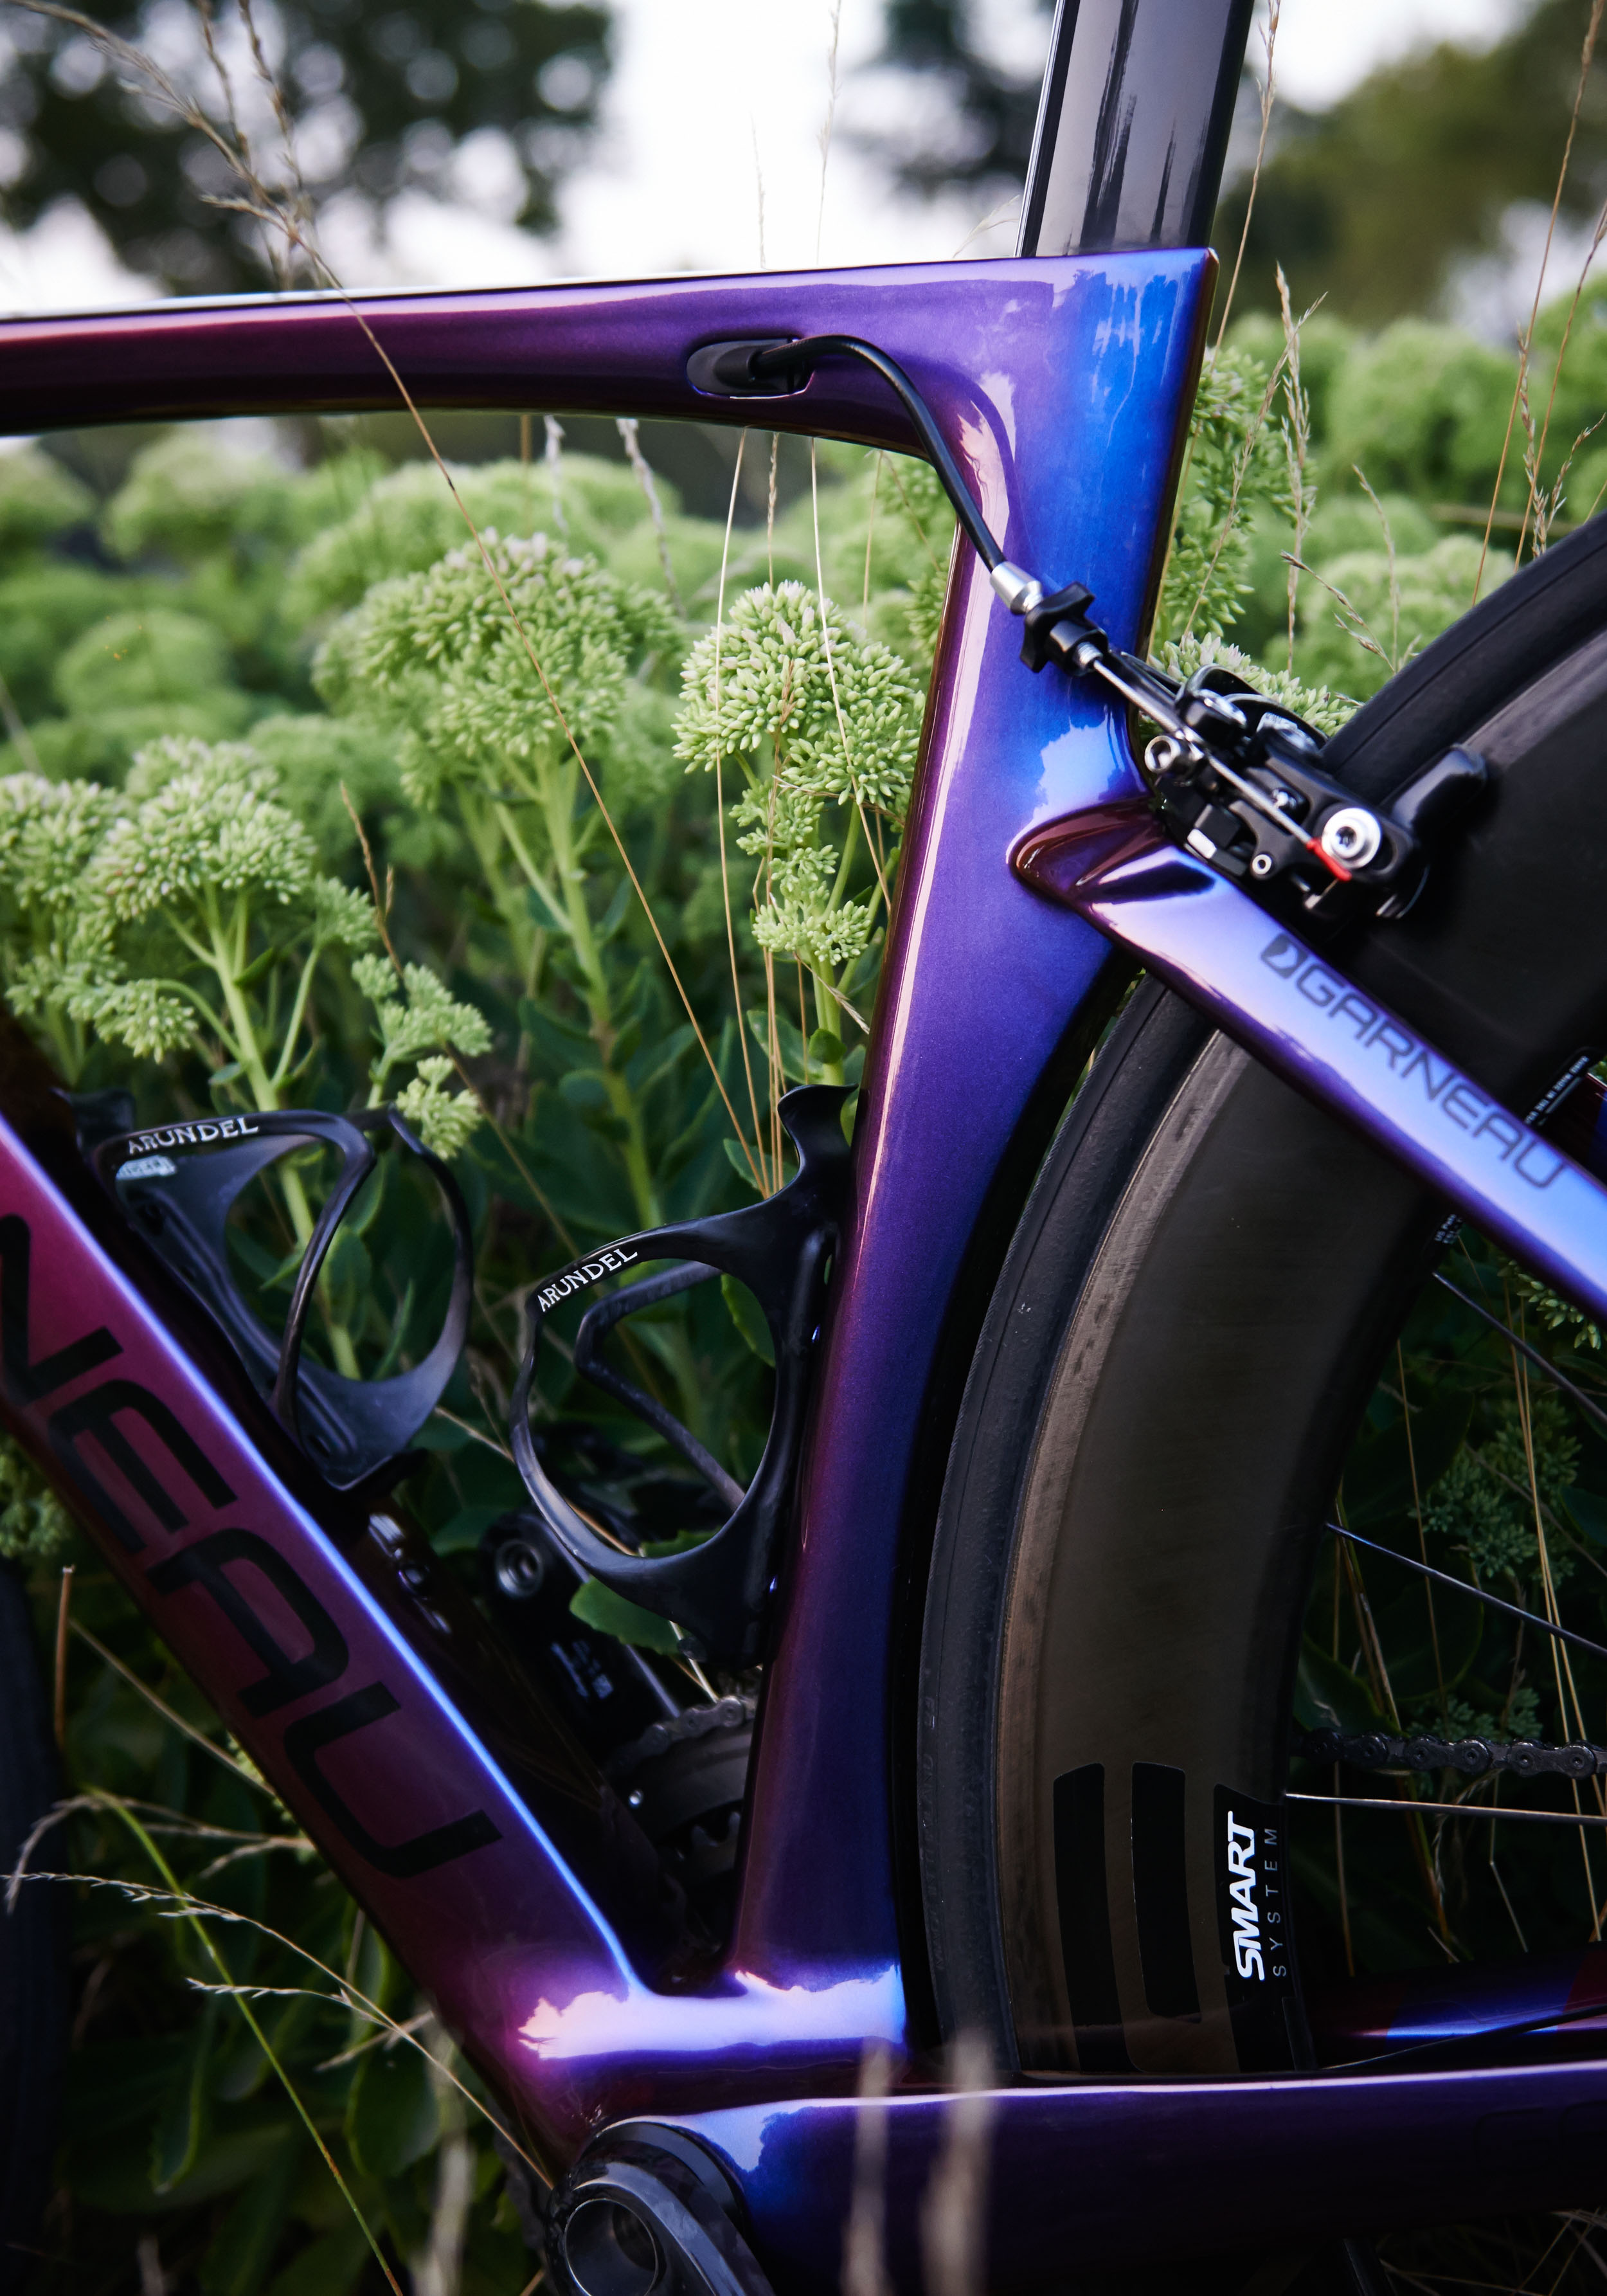 to-be-determined-garneau-a1-bike-review-119.jpg